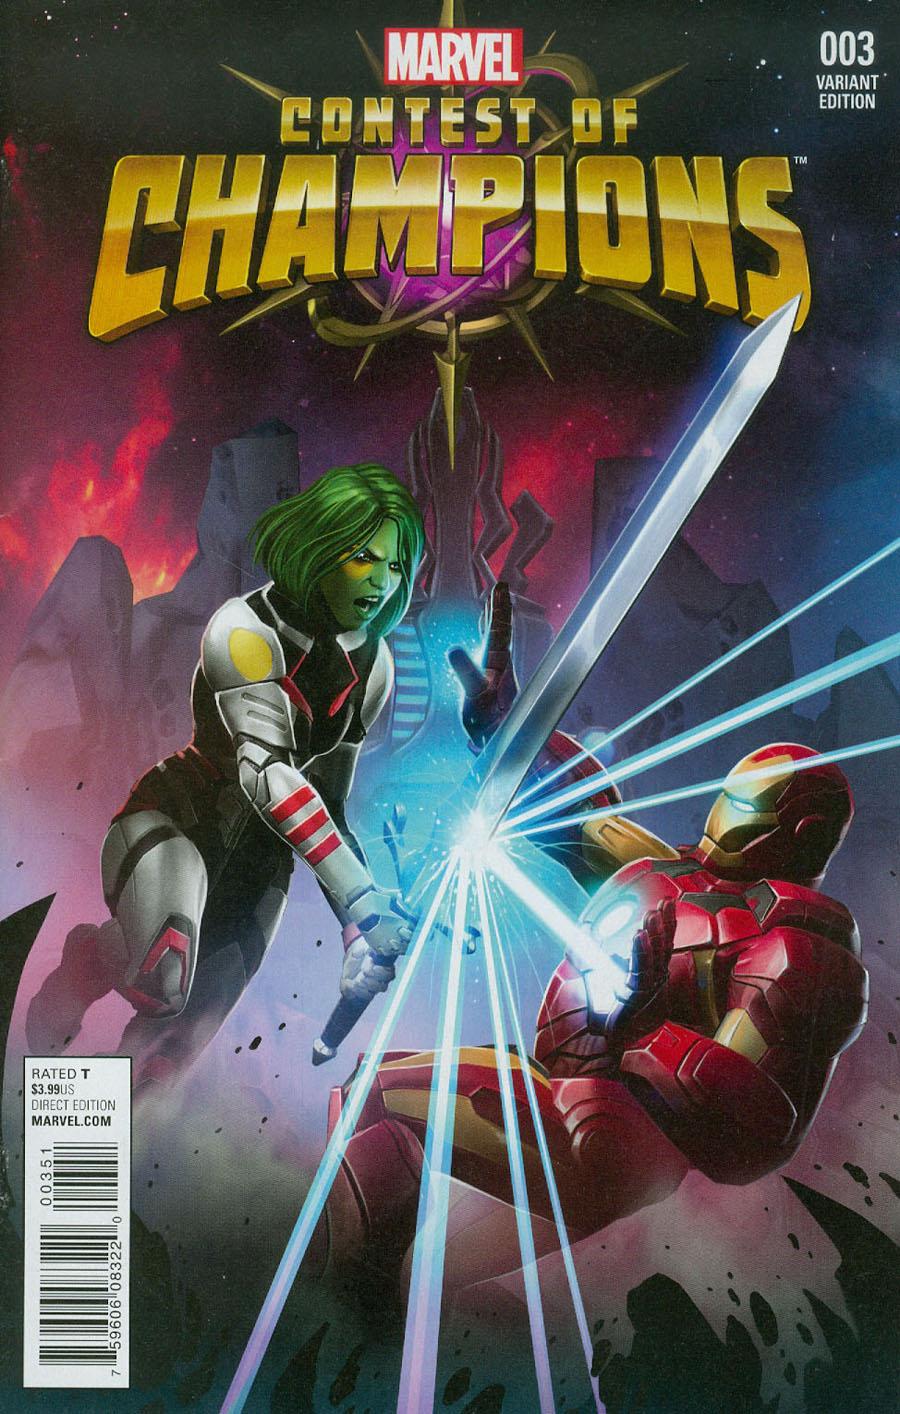 Contest Of Champions Vol 3 #3 Cover C Incentive Kabam Contest Of Champions Game Variant Cover